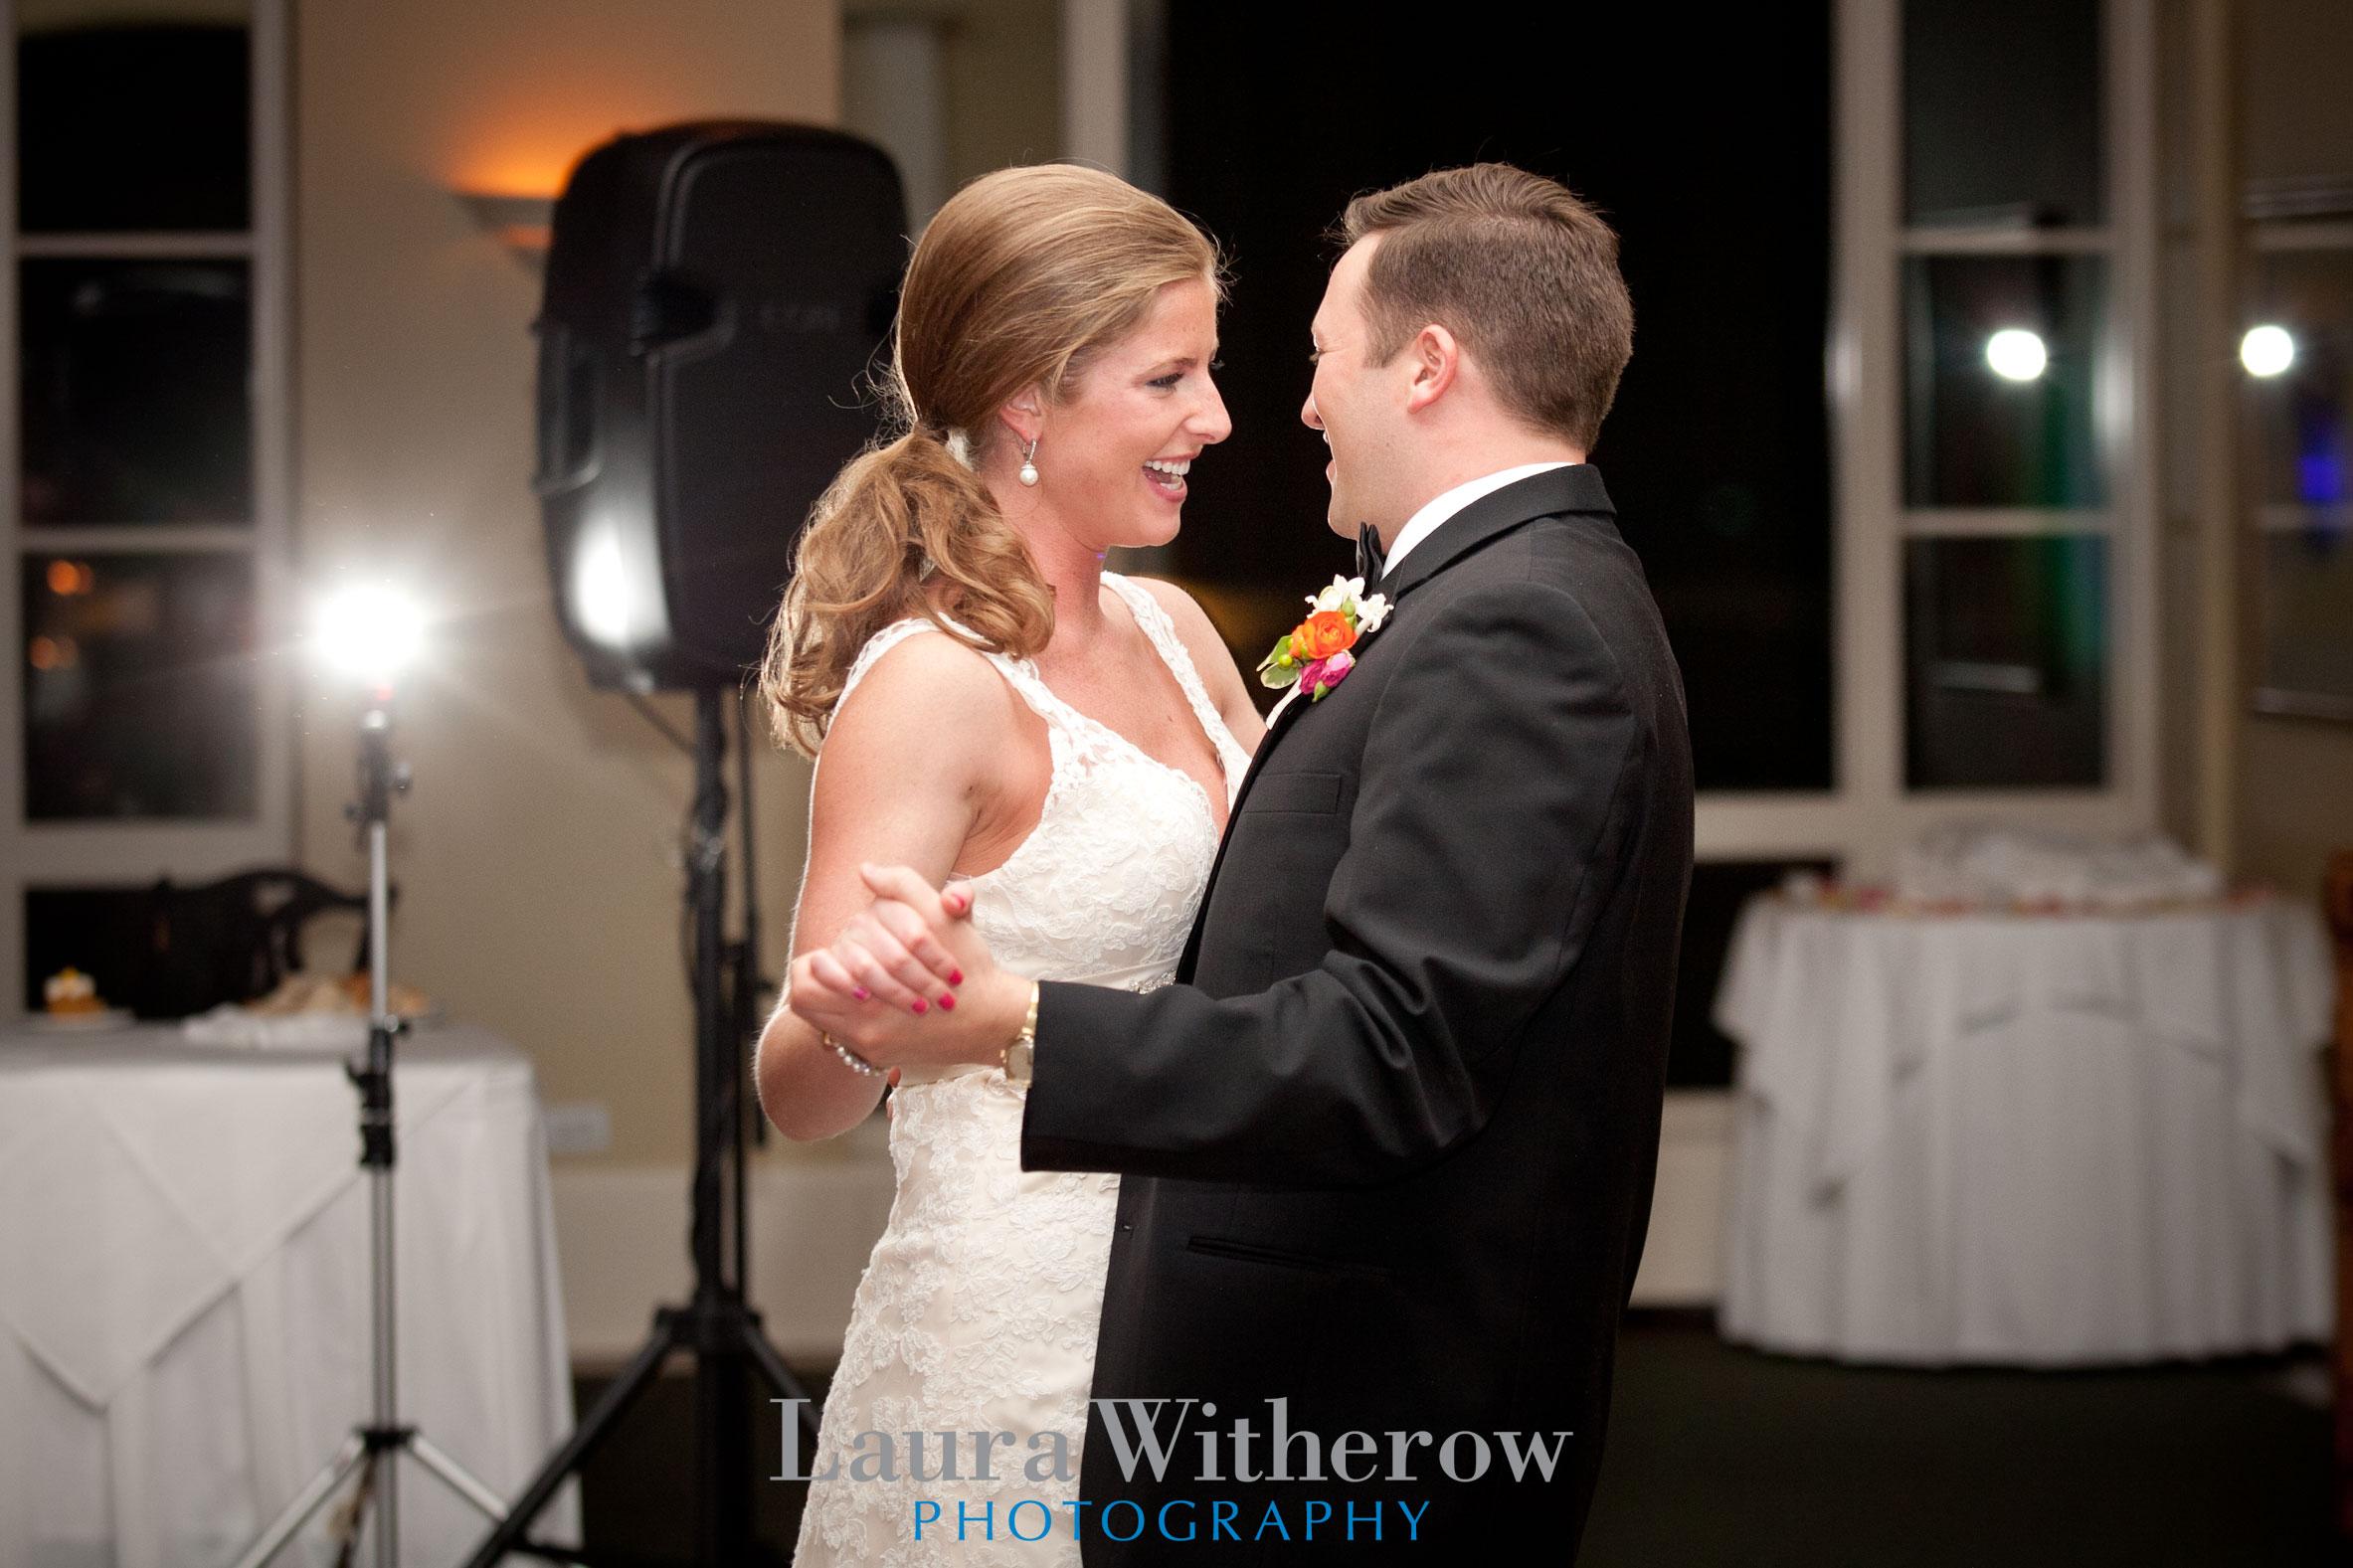 hindale-wedding-photographer.jpg